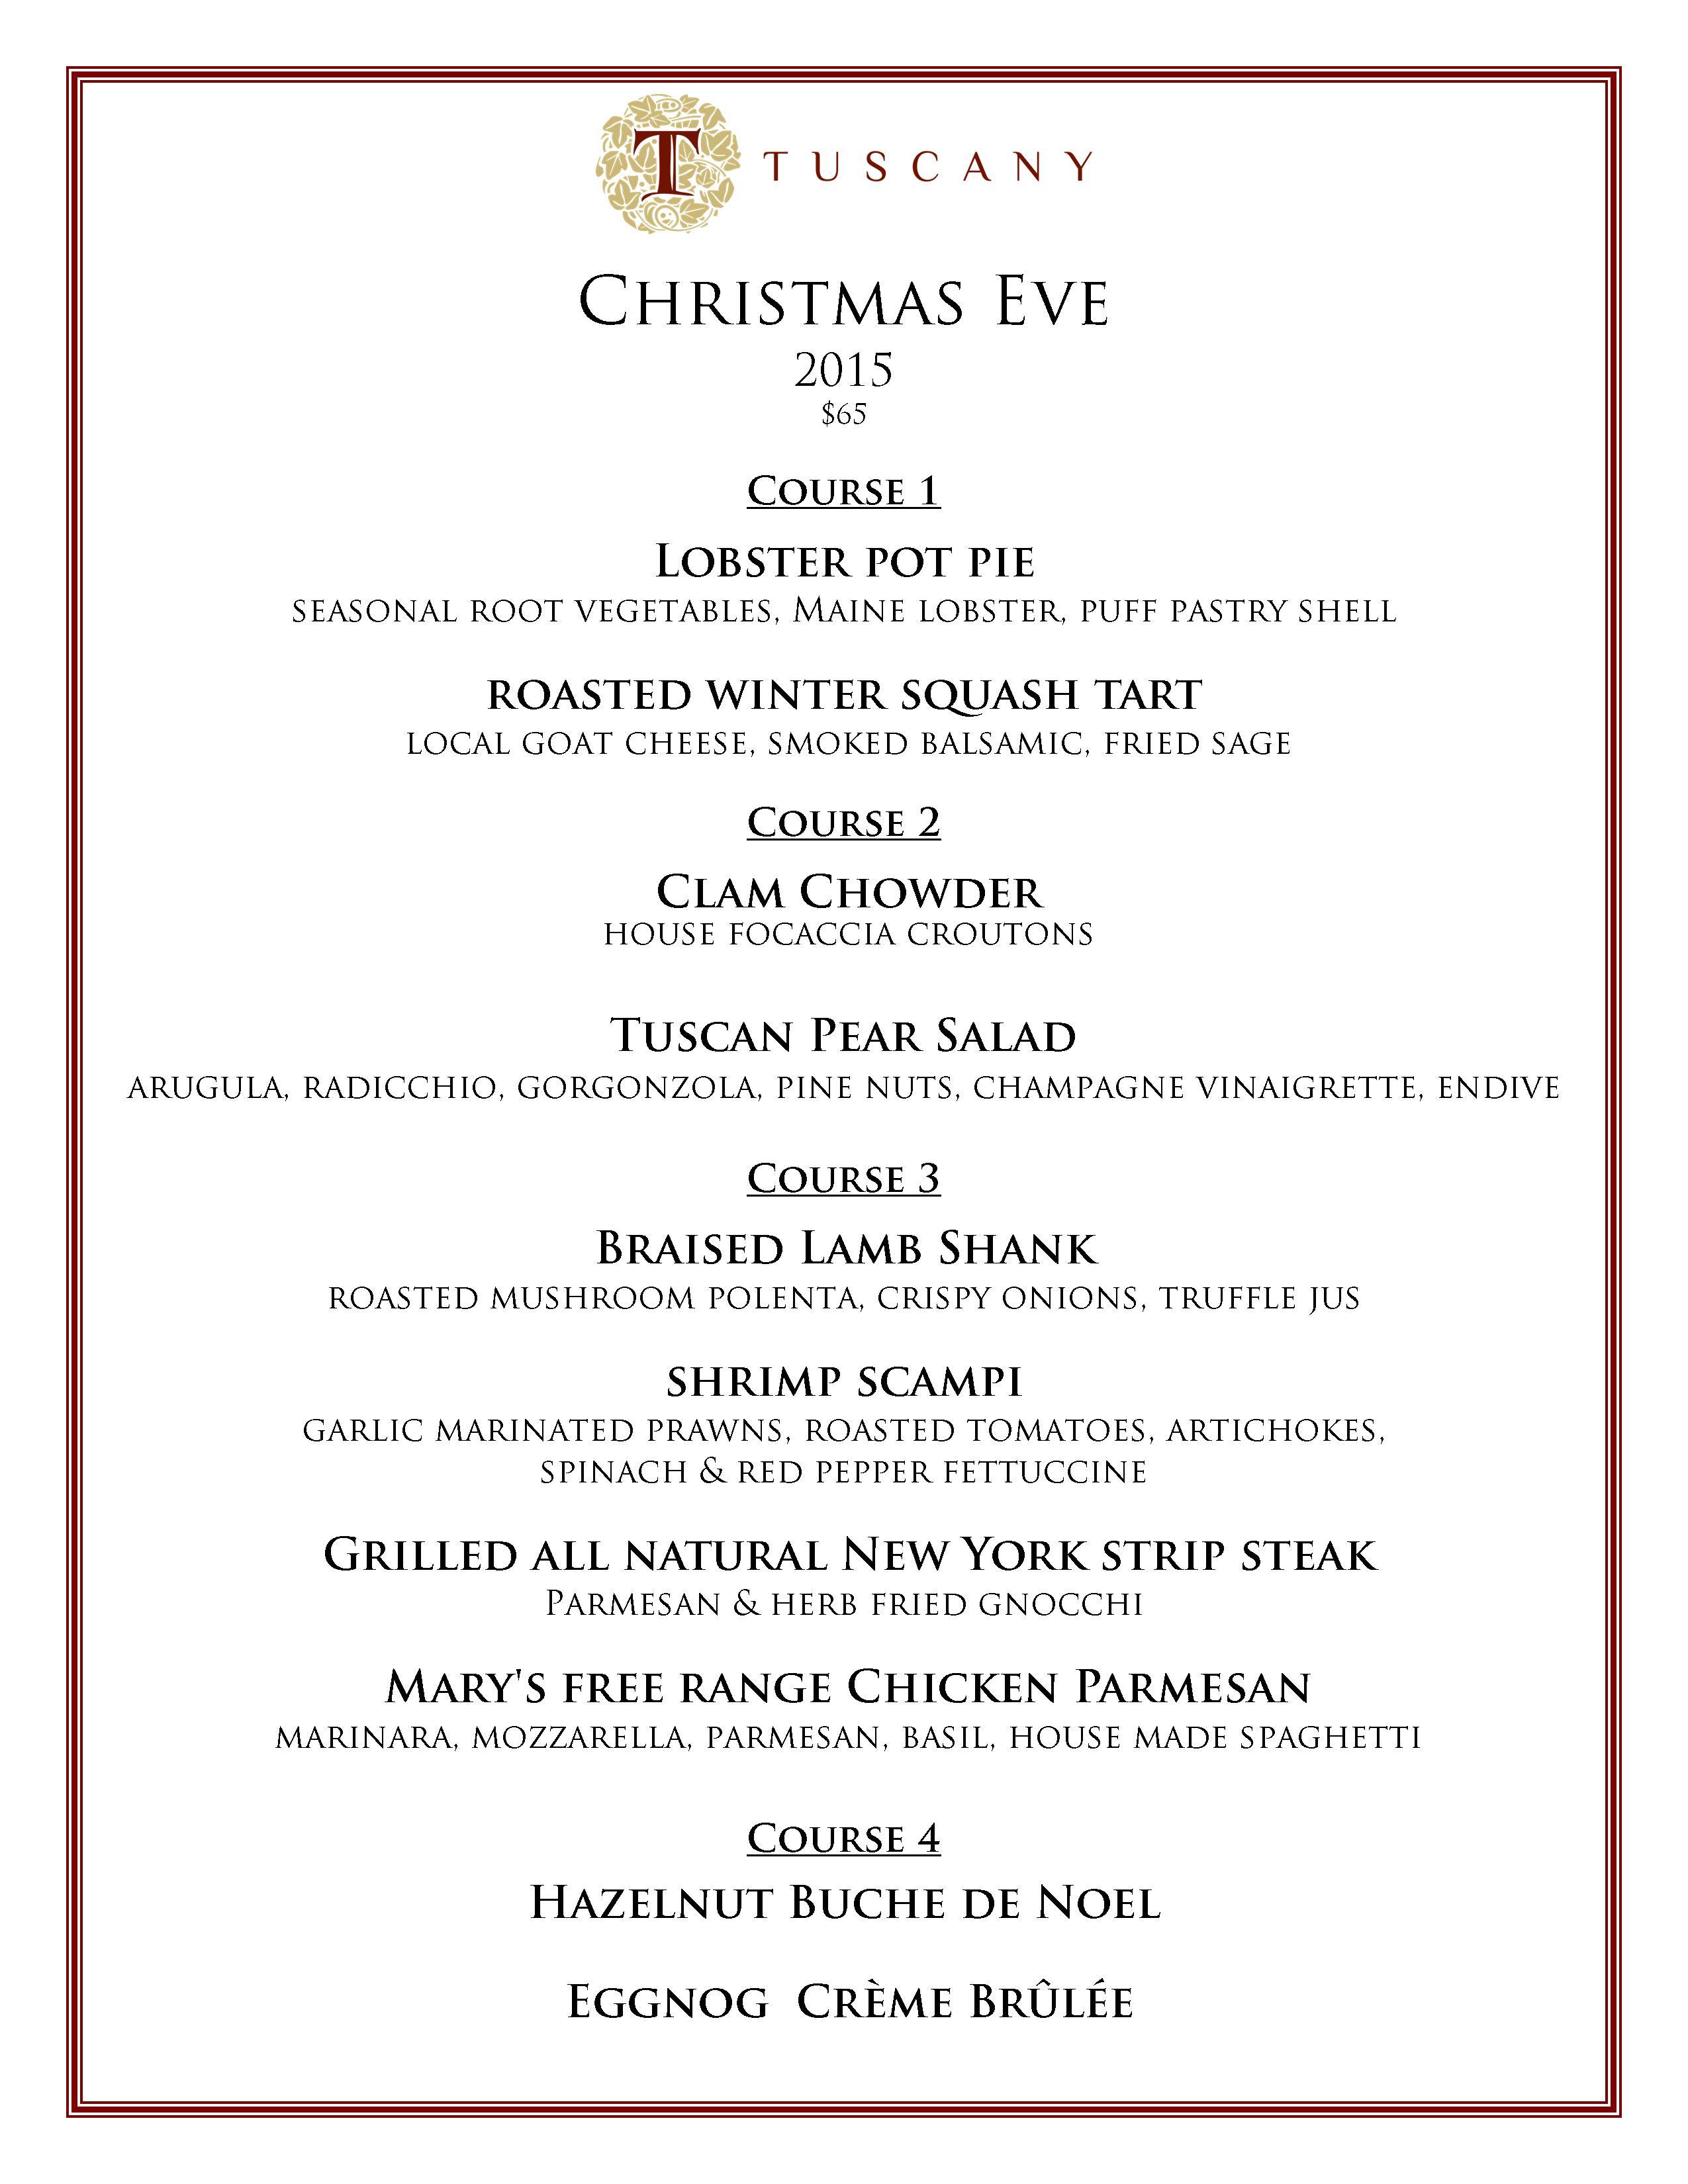 Christmas Eve Dinner Menu.Christmas Eve 2015 Tuscany Restaurant